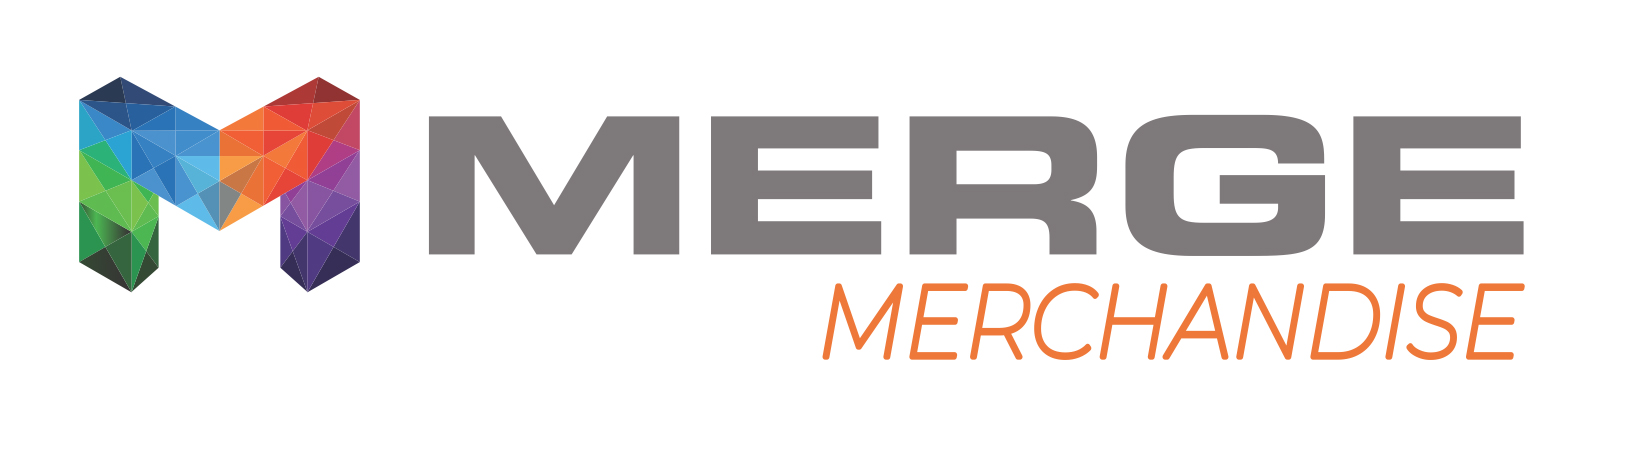 Merge Merchandise